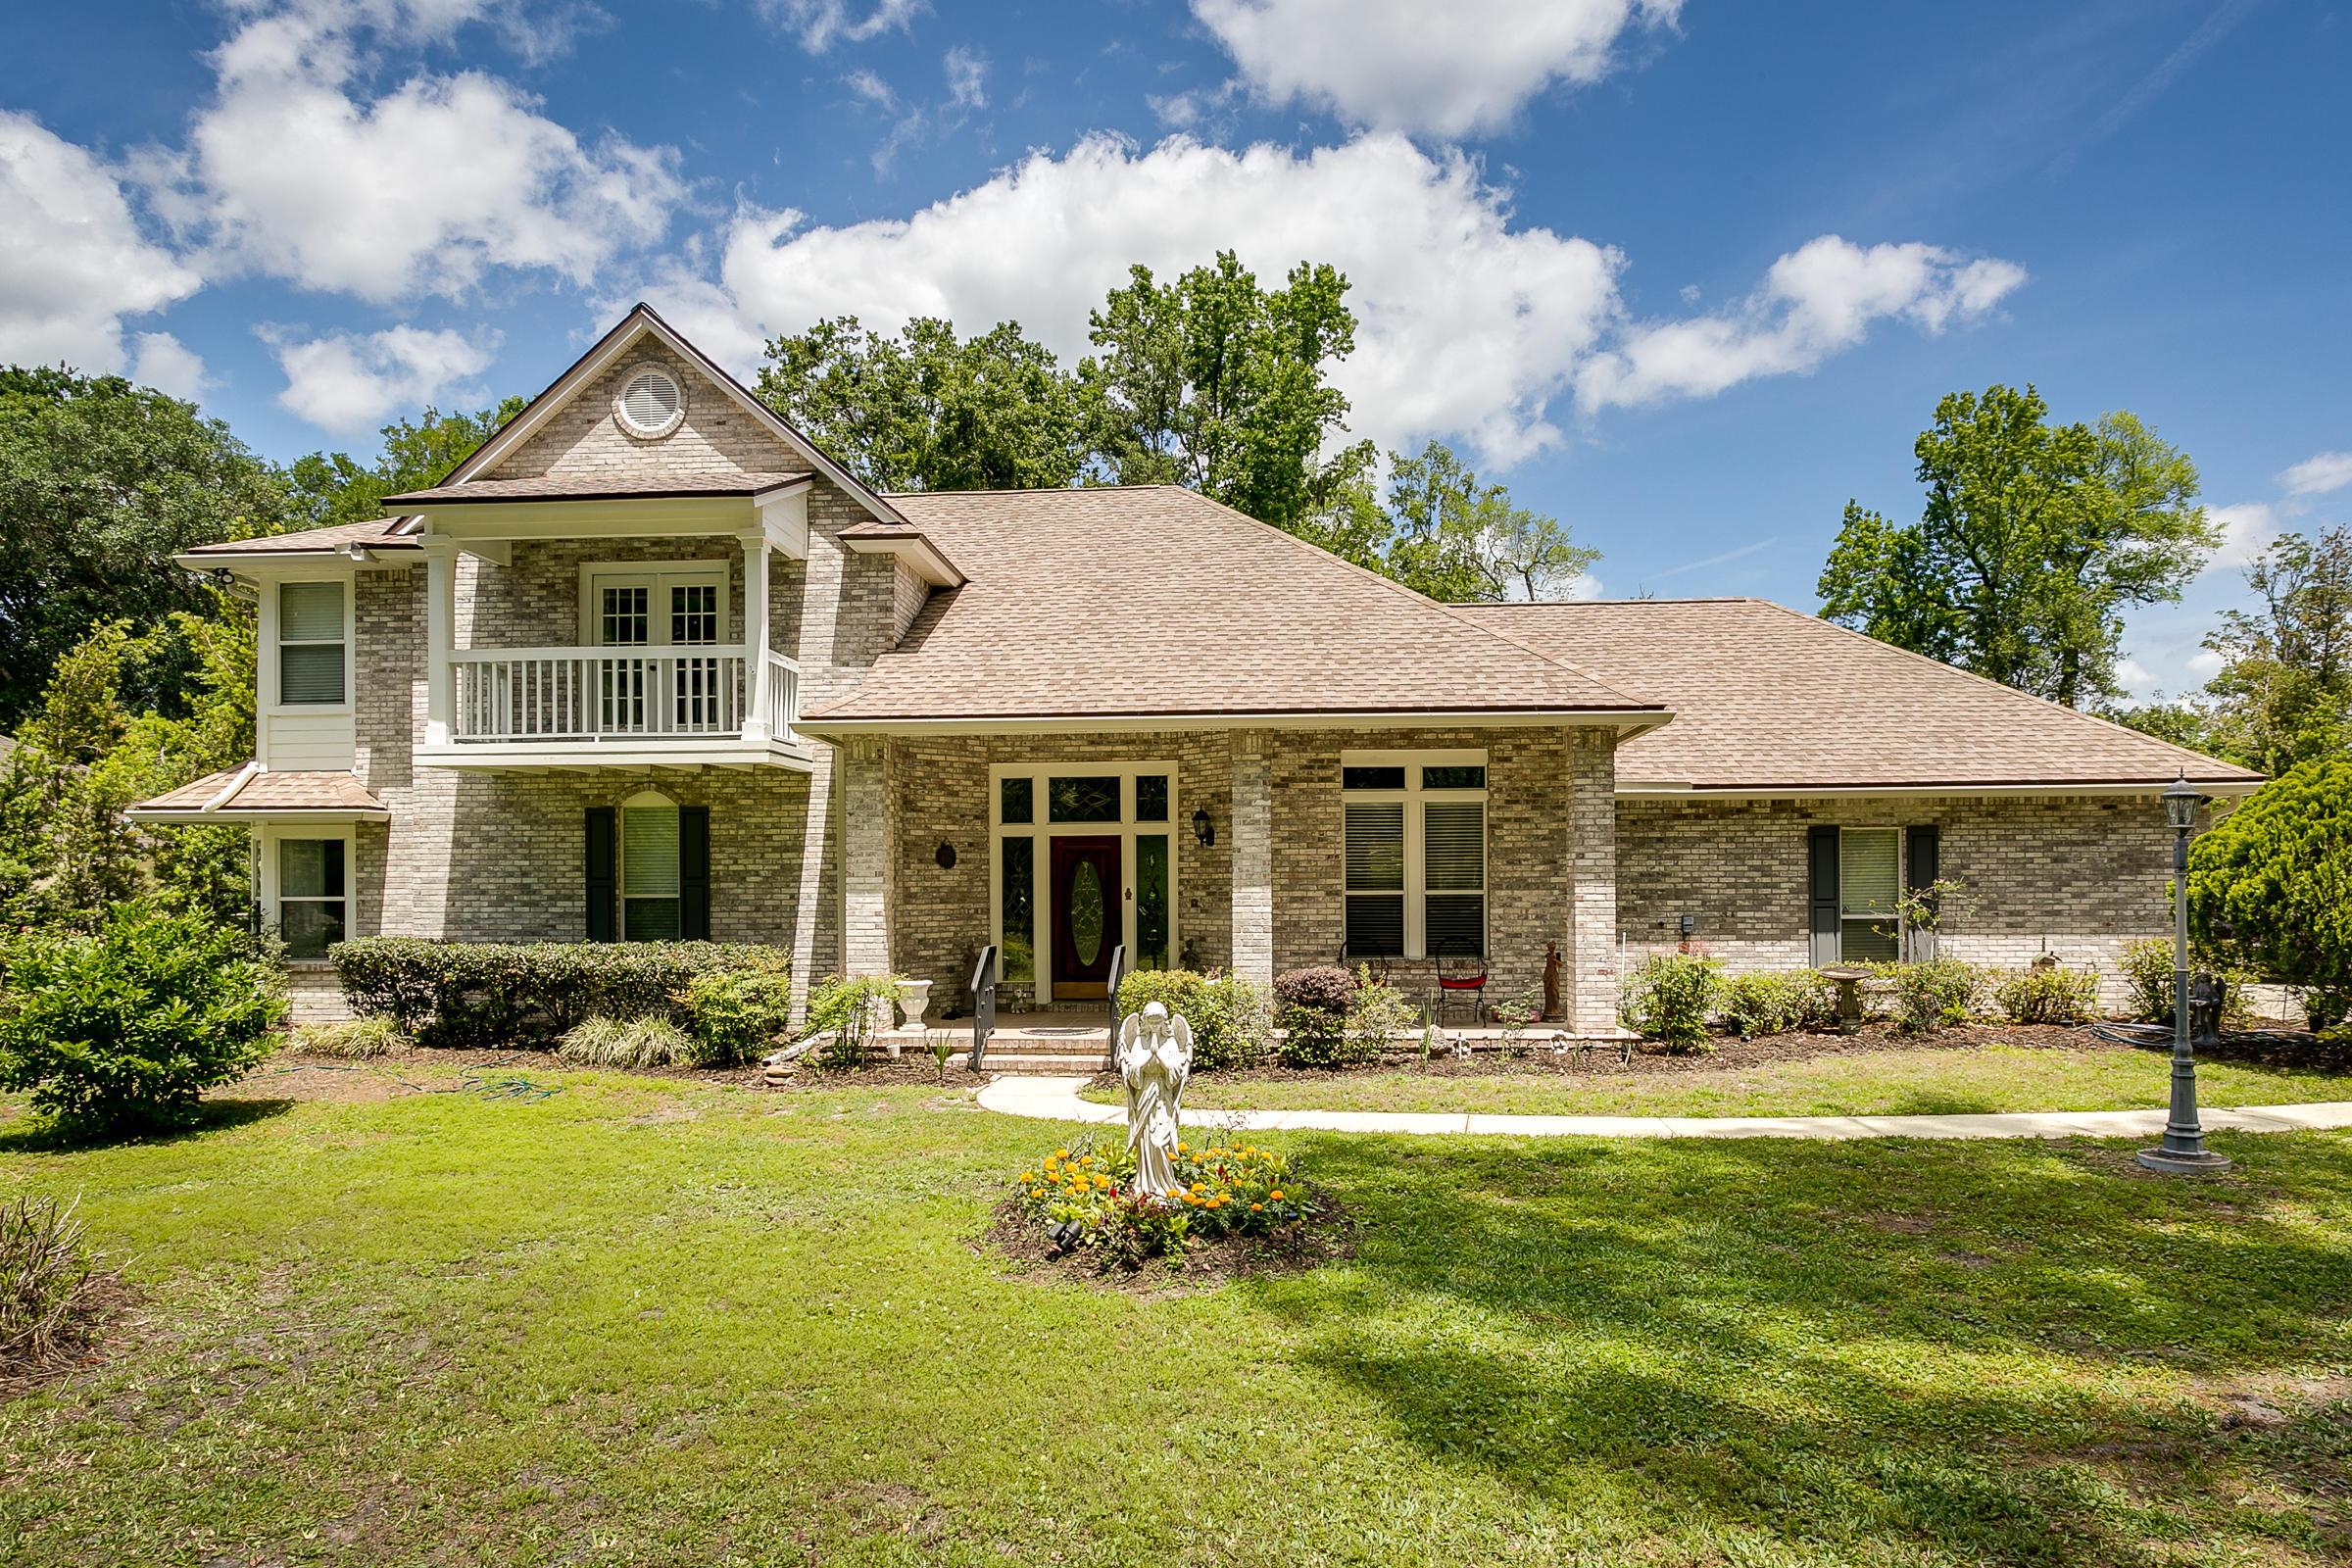 413 RIVER BIRCH, FLEMING ISLAND, FLORIDA 32003, 3 Bedrooms Bedrooms, ,2 BathroomsBathrooms,Residential,For sale,RIVER BIRCH,1108182